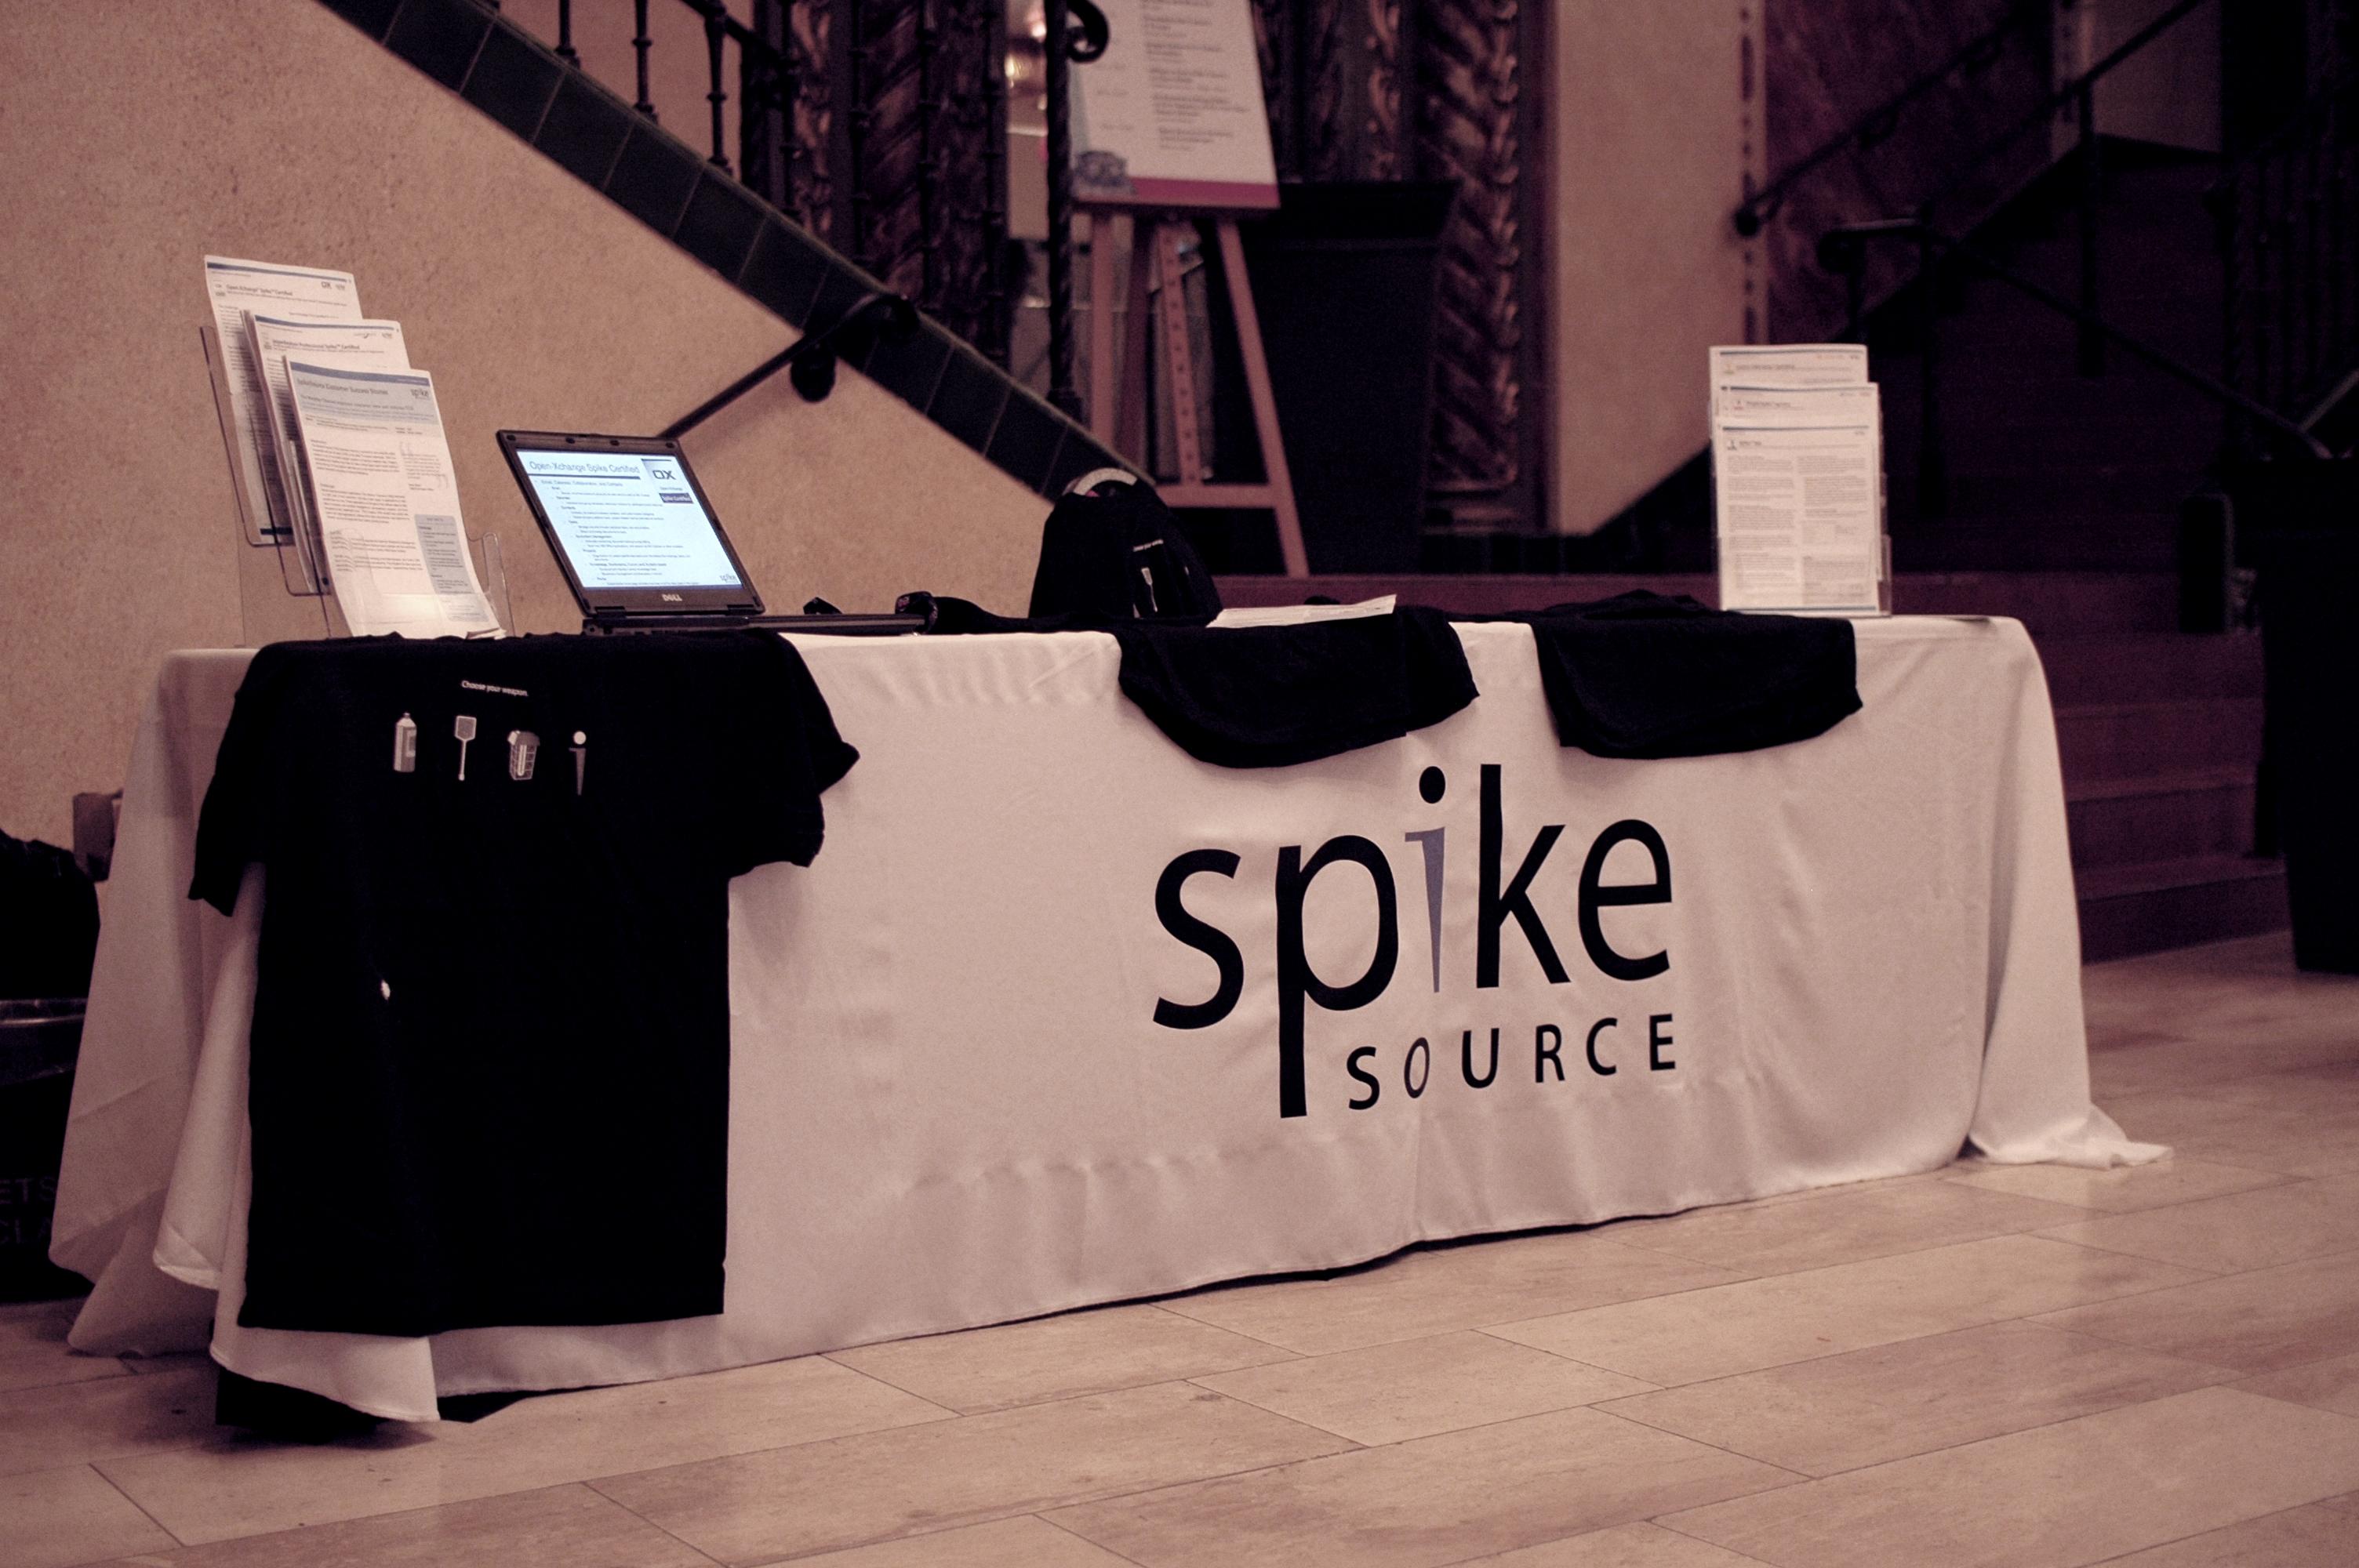 Spikesource